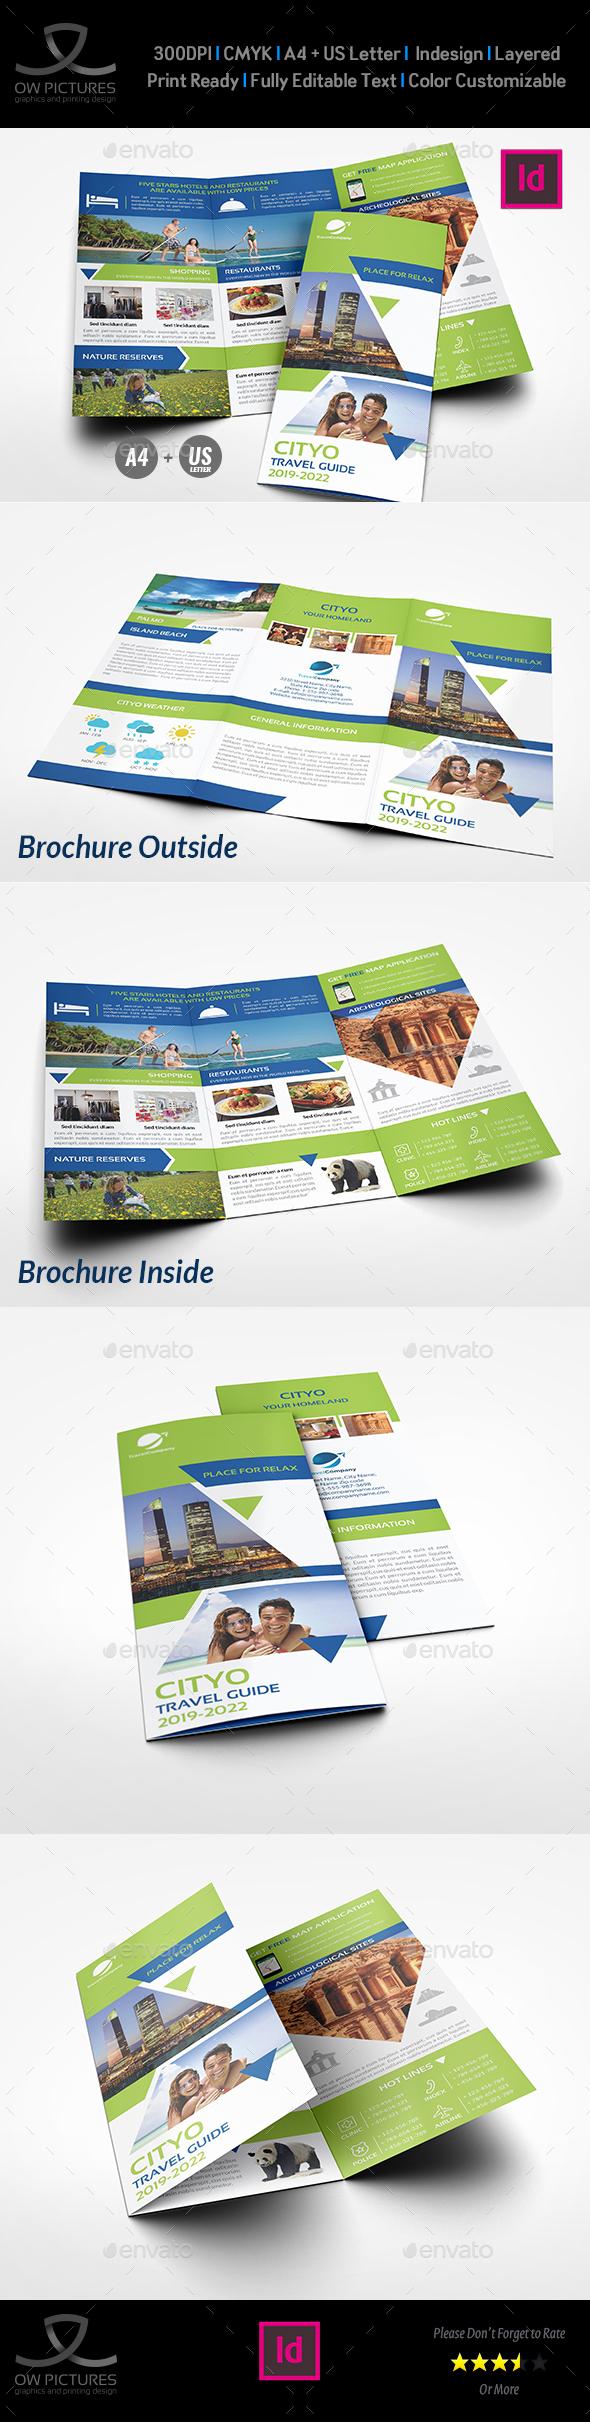 Travel Guide Tri Fold Brochure Template